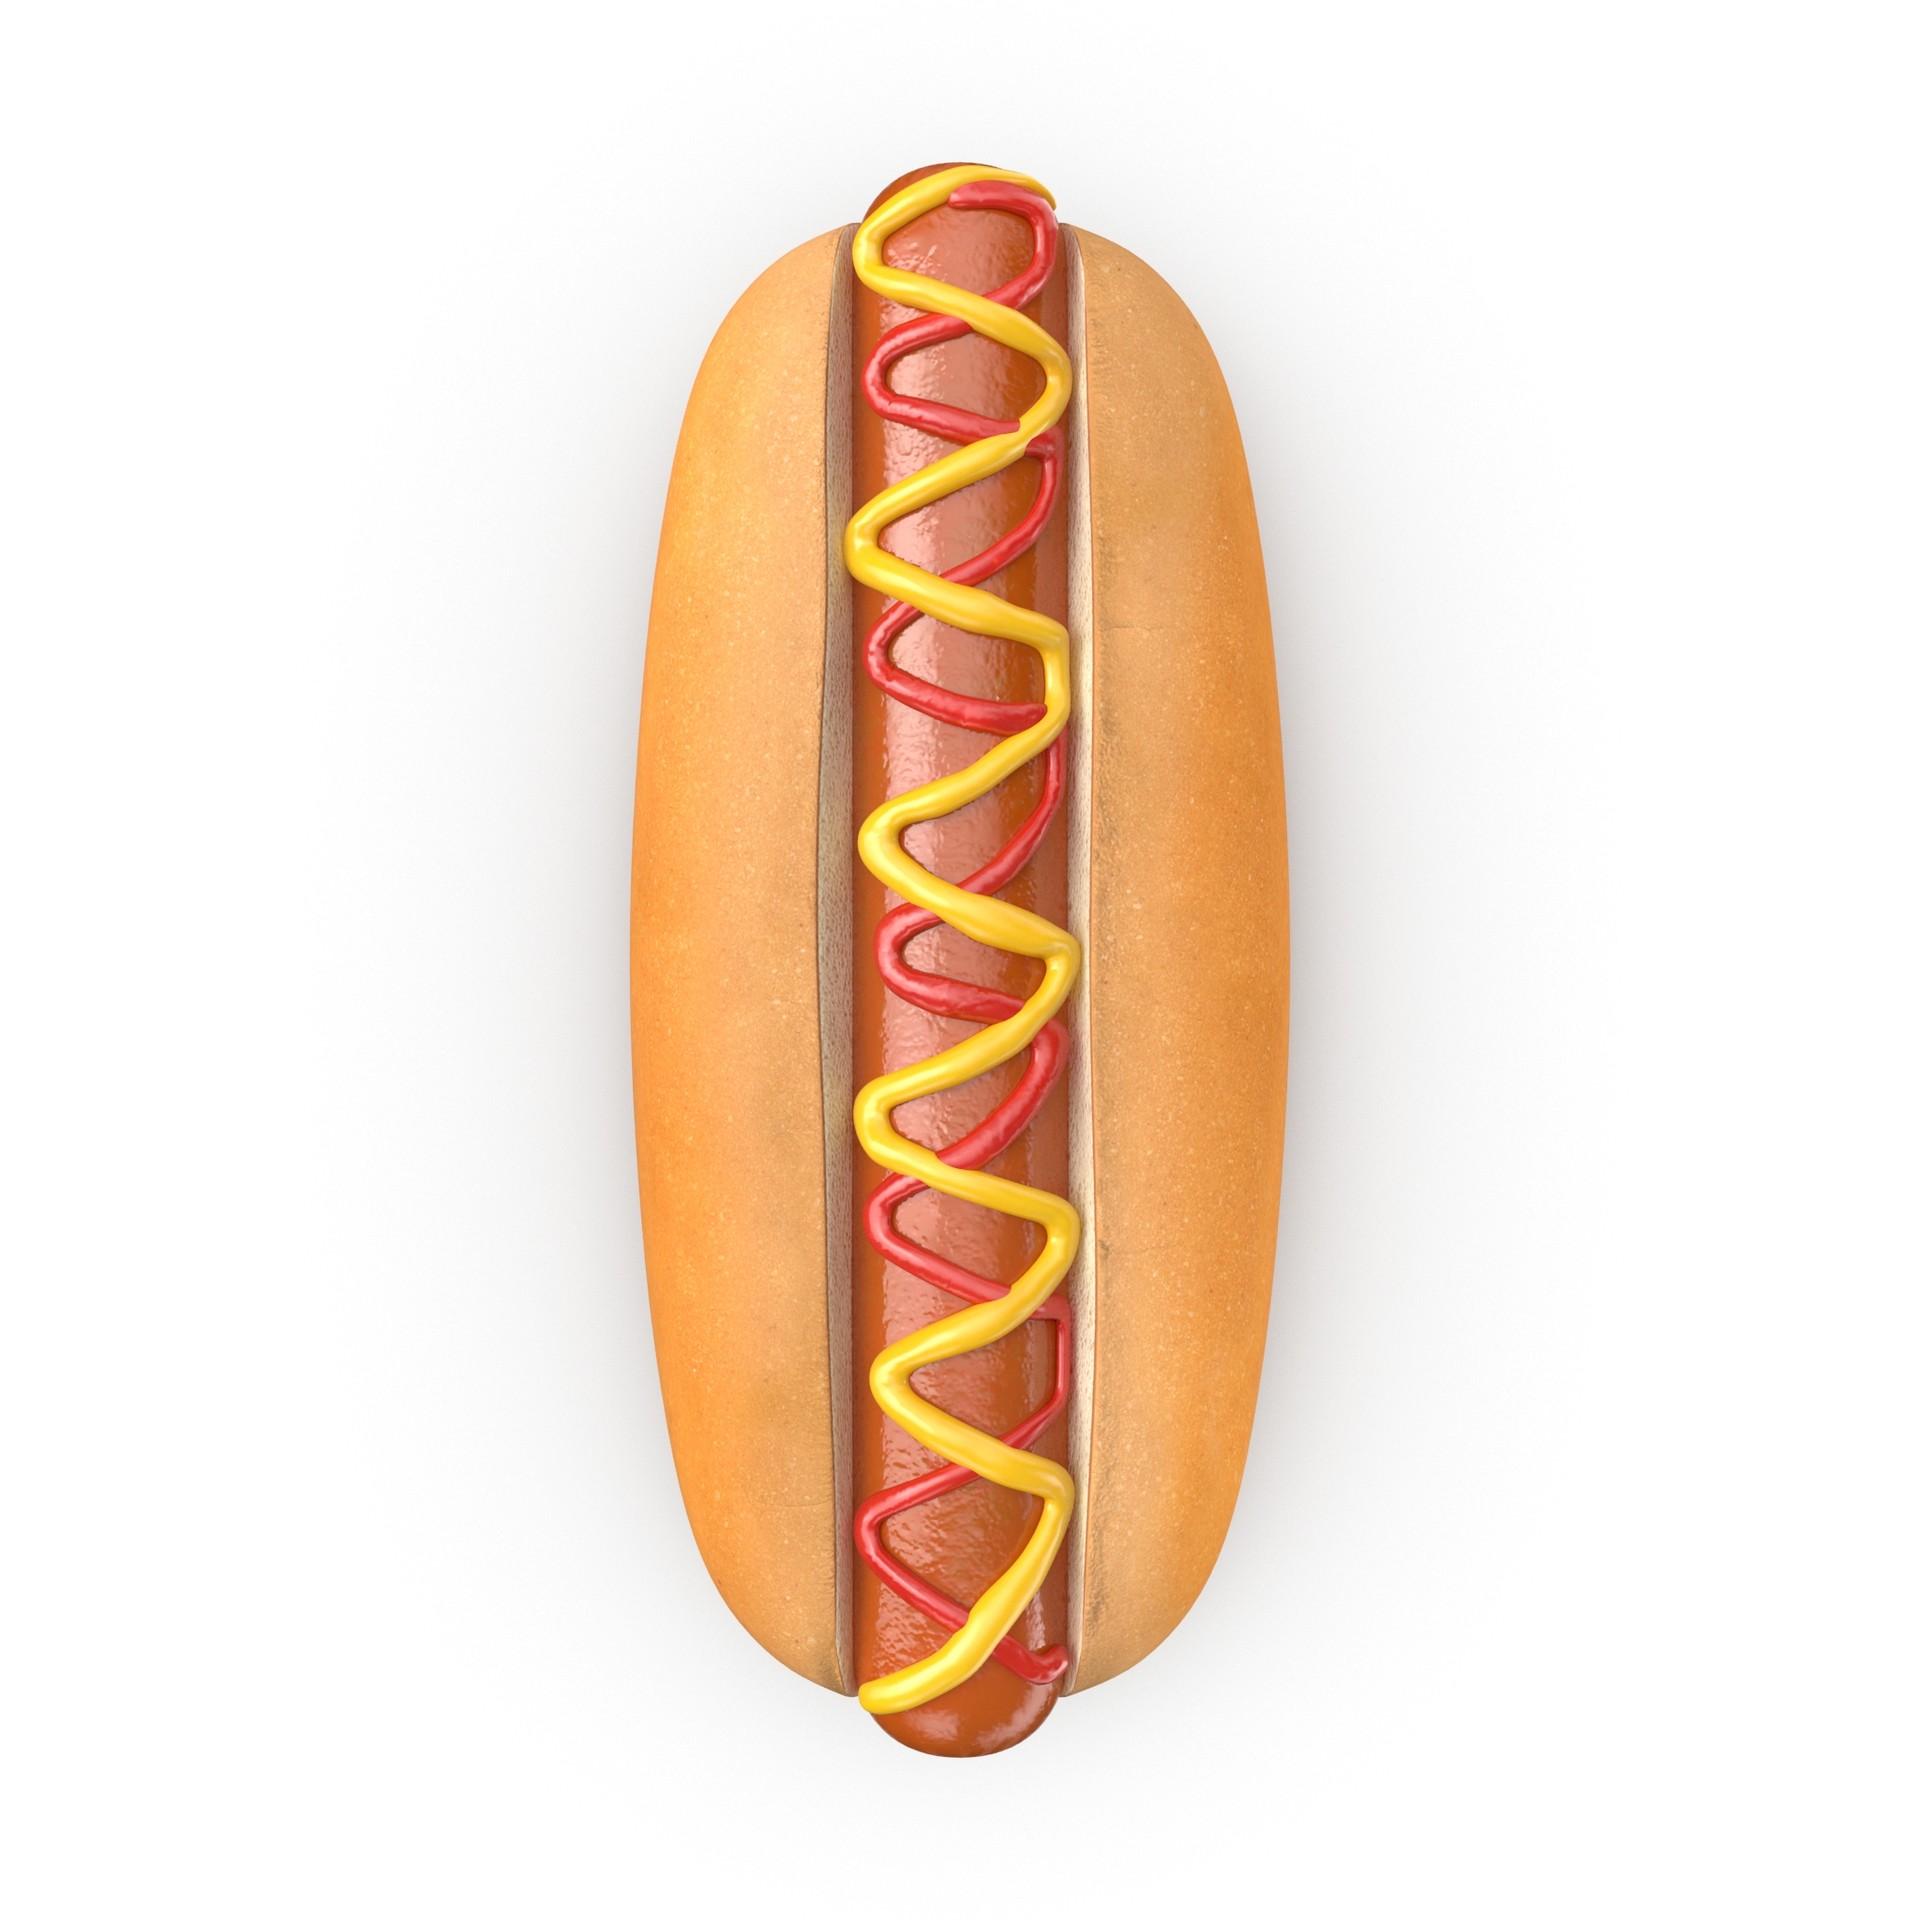 Oziel leal salinas hotdog 0000